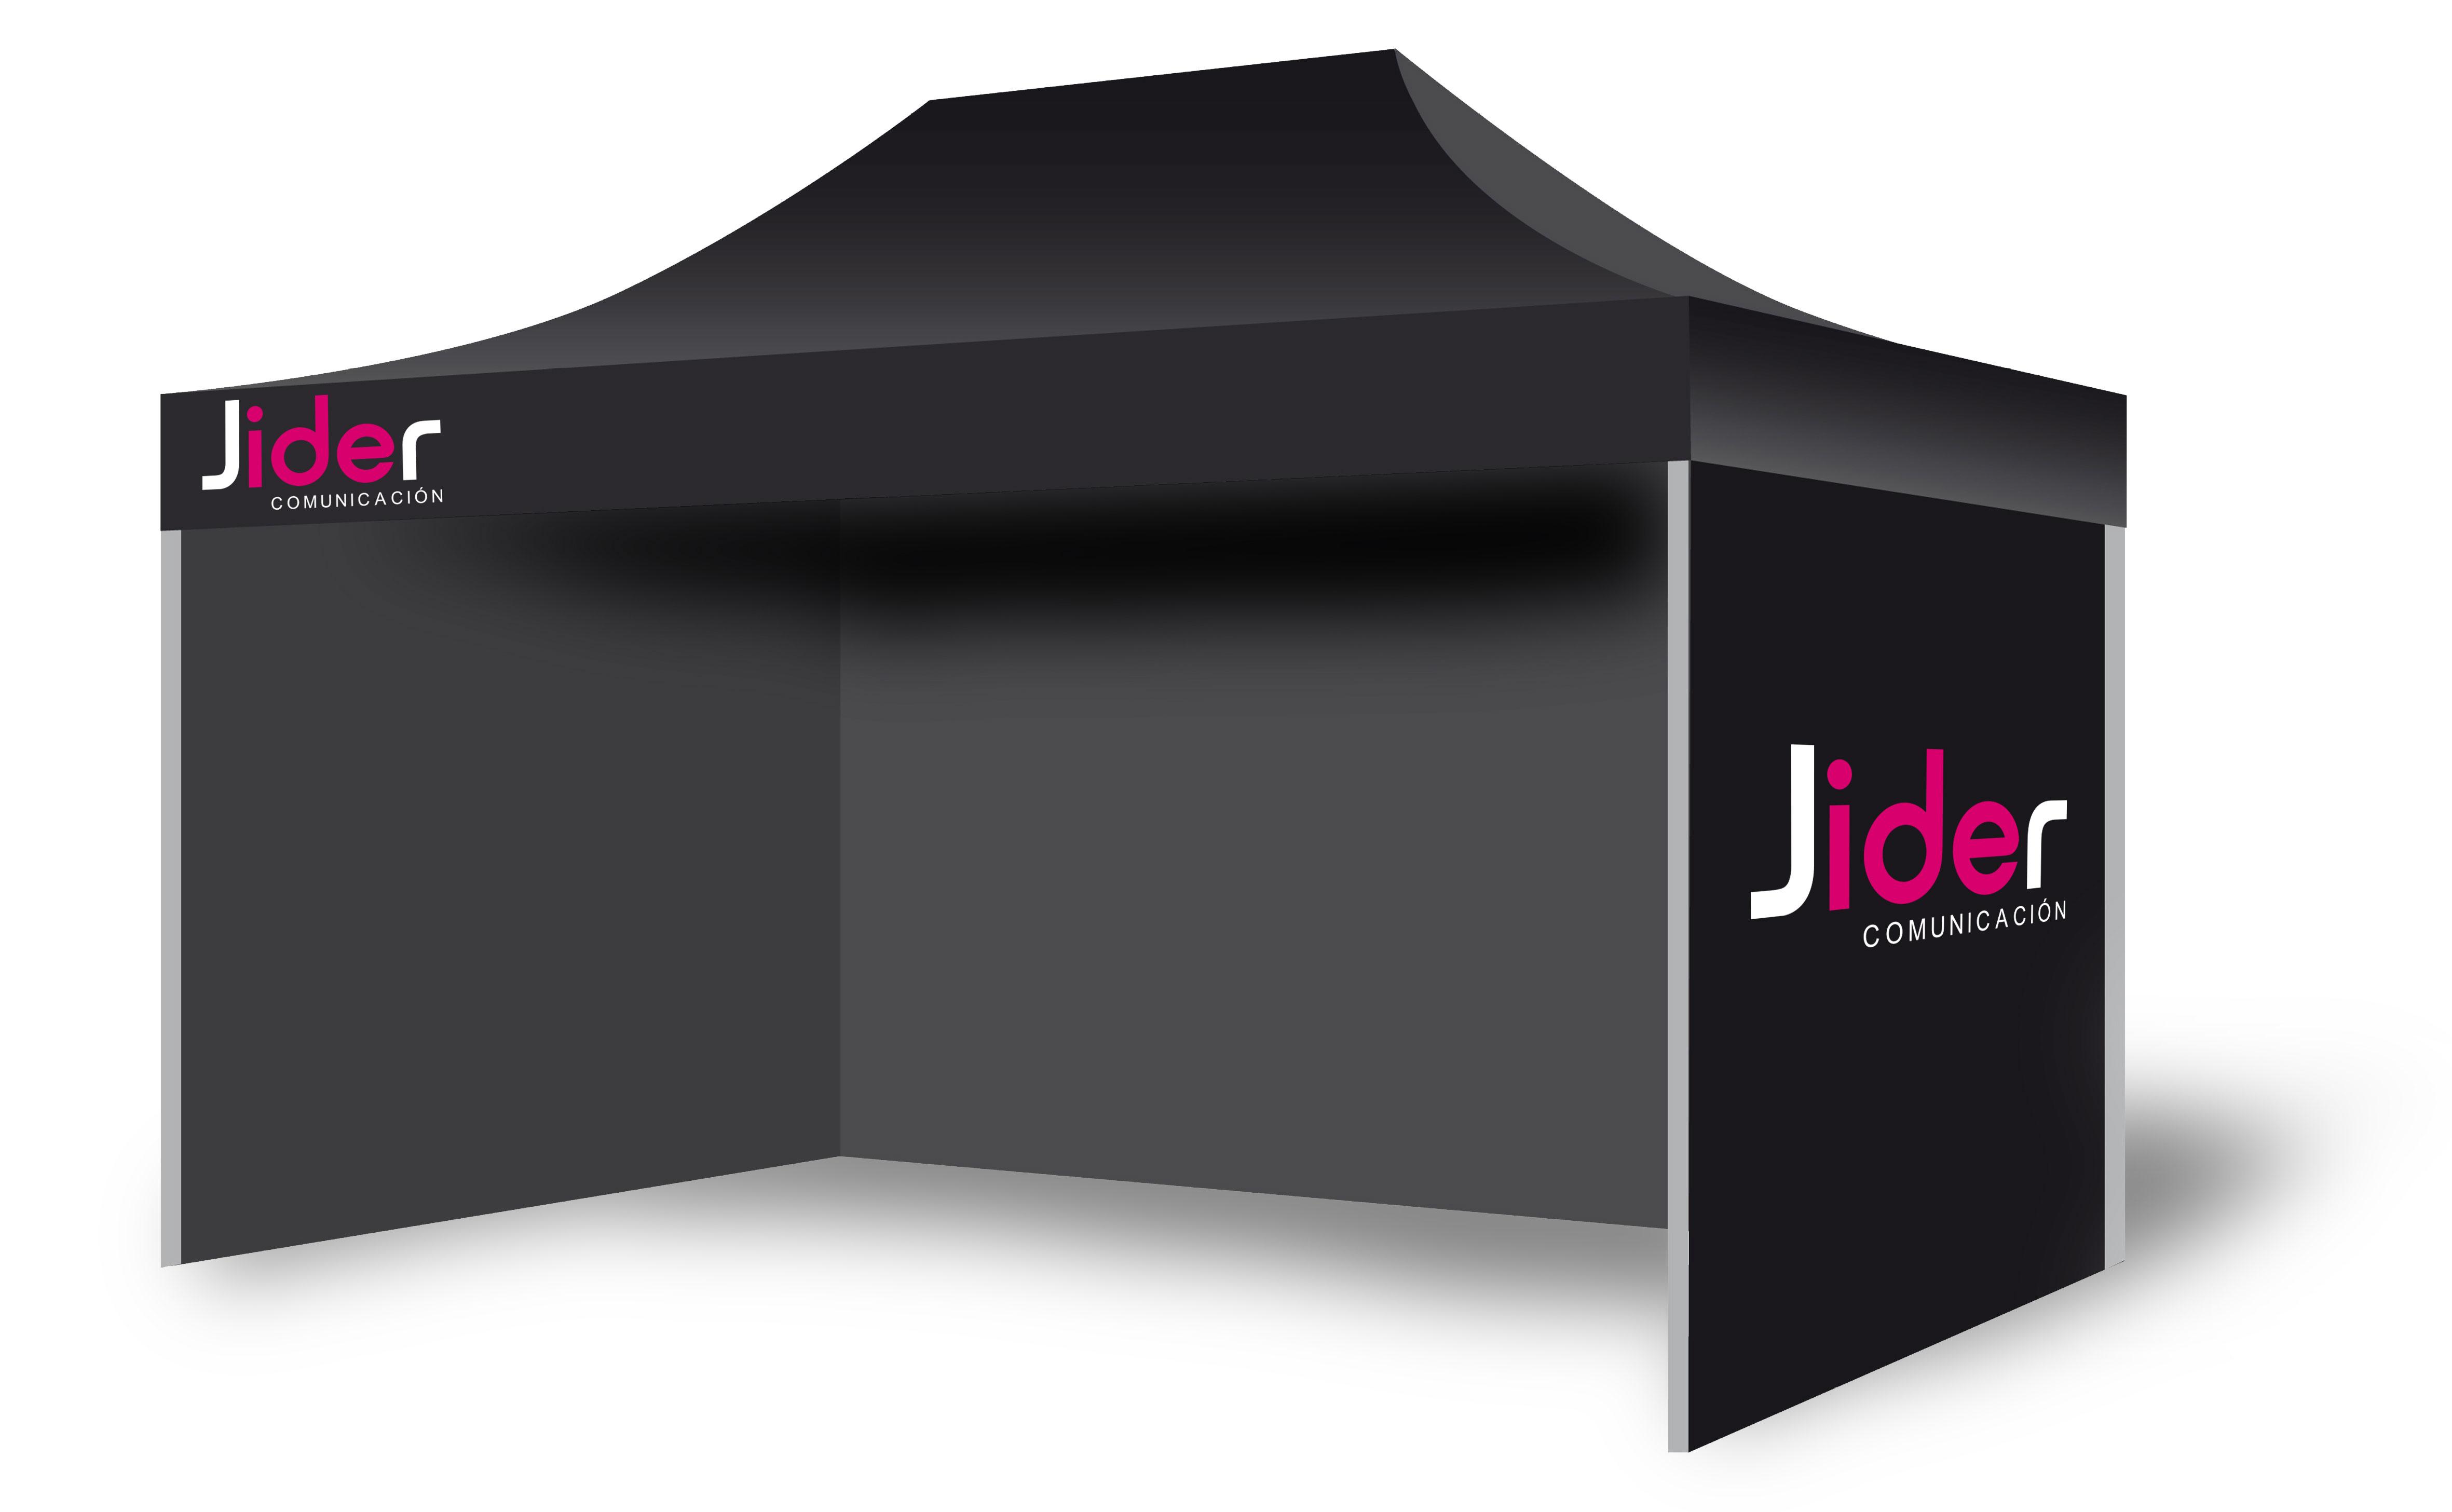 jider-comunicacion-servicios-mobiliario